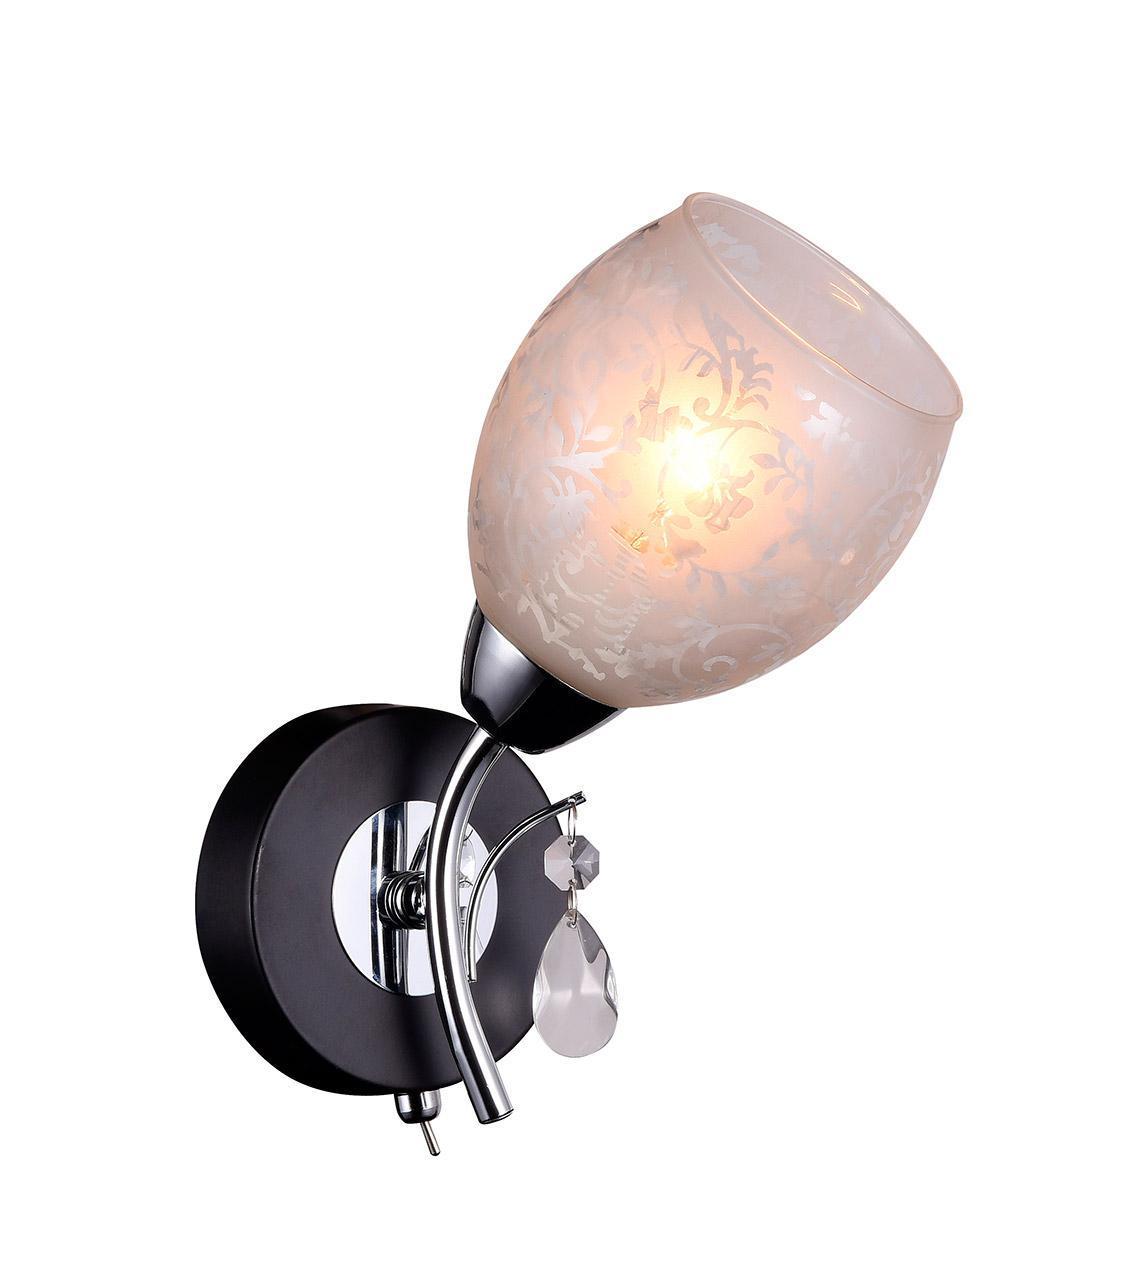 Бра IDLamp Agnes 843/1A-Blackchrome бра idlamp 843 843 1a blackchrome